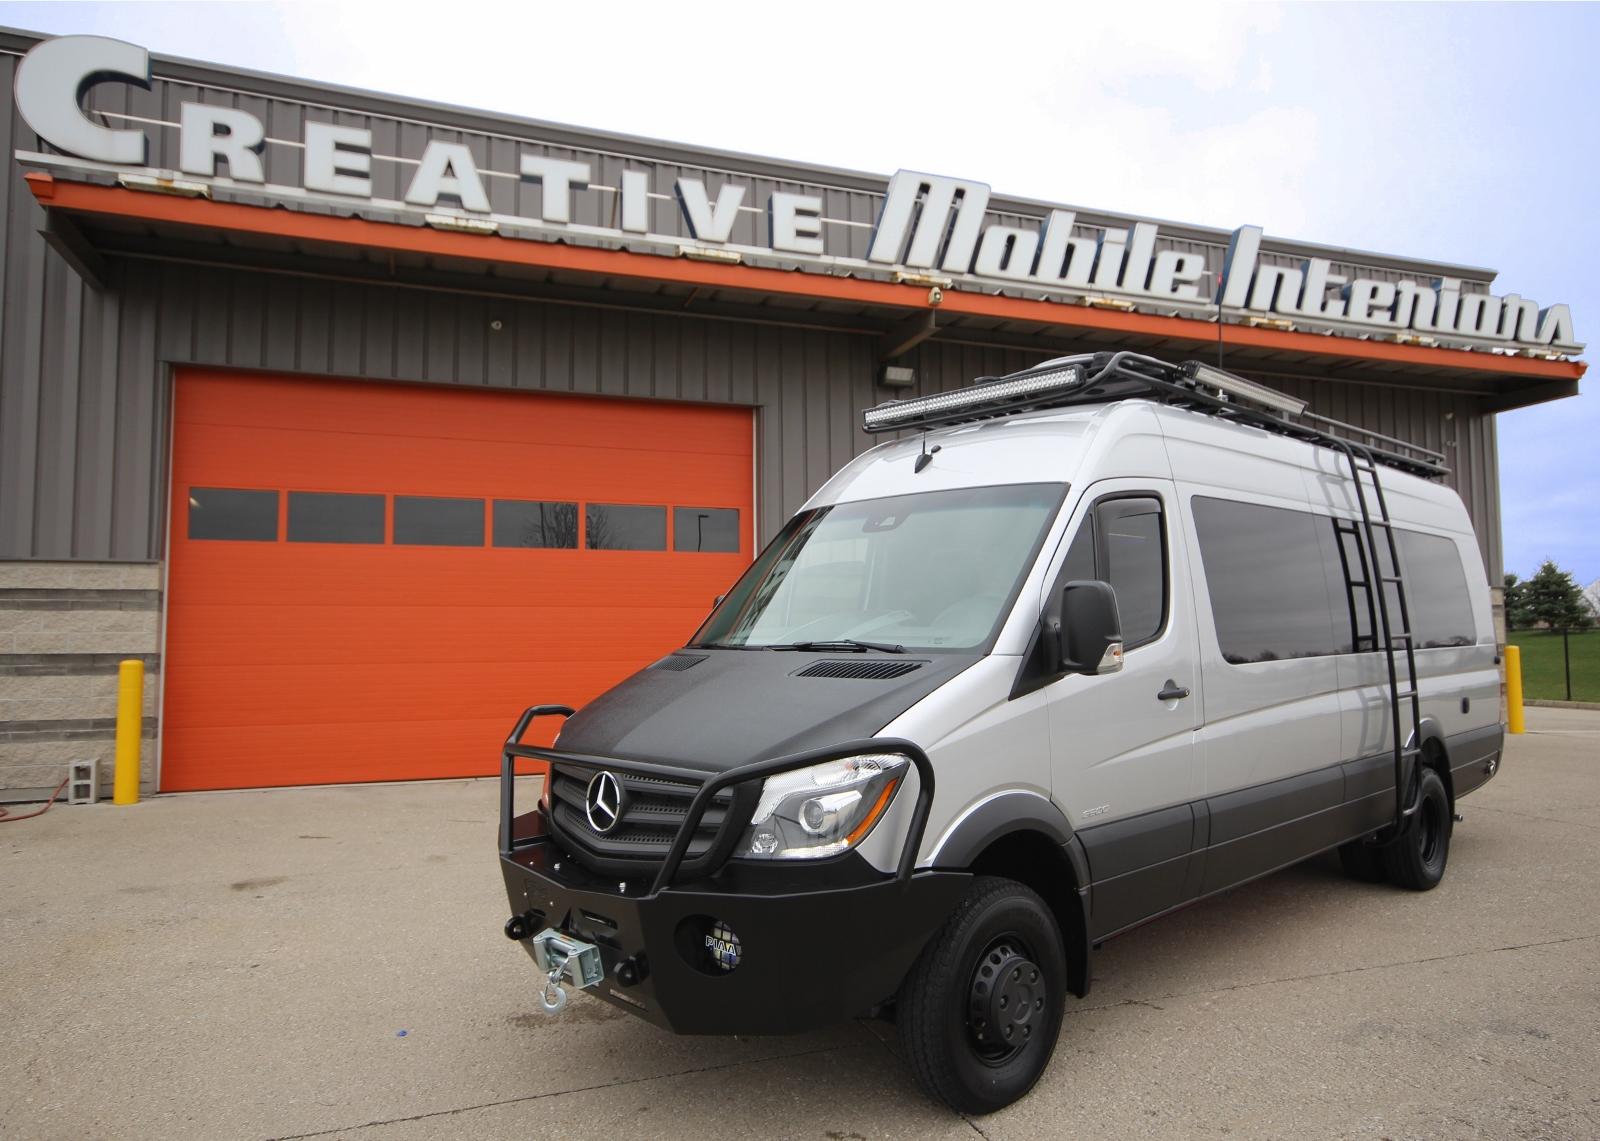 4x4 Sprinter Van For Sale >> 2016 Loaded 4x4 Sprinter